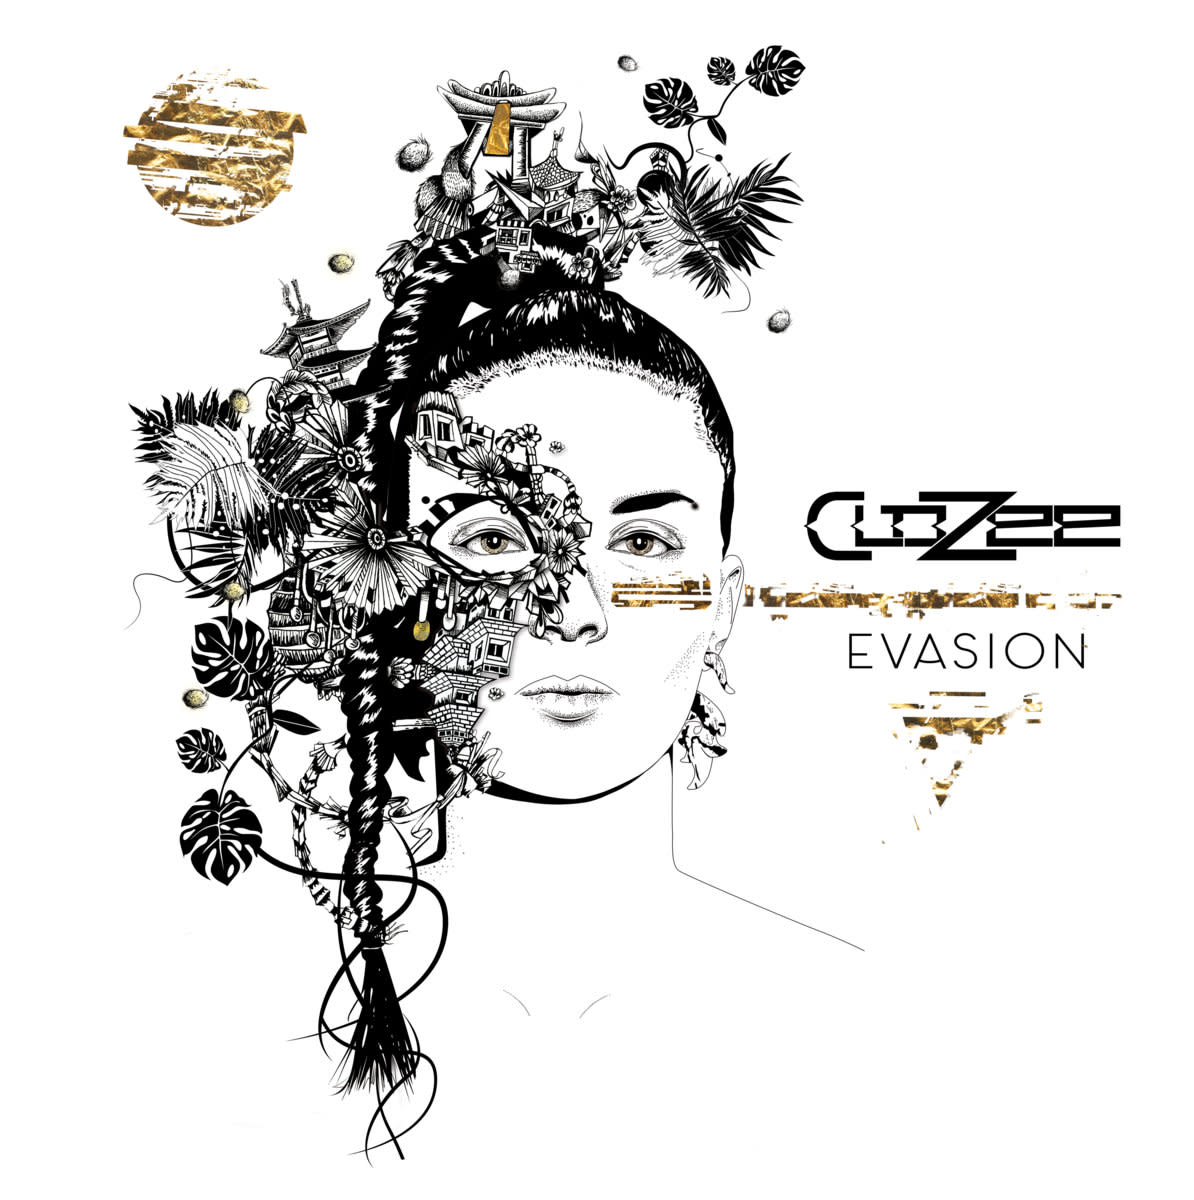 CloZee - EVASION LP